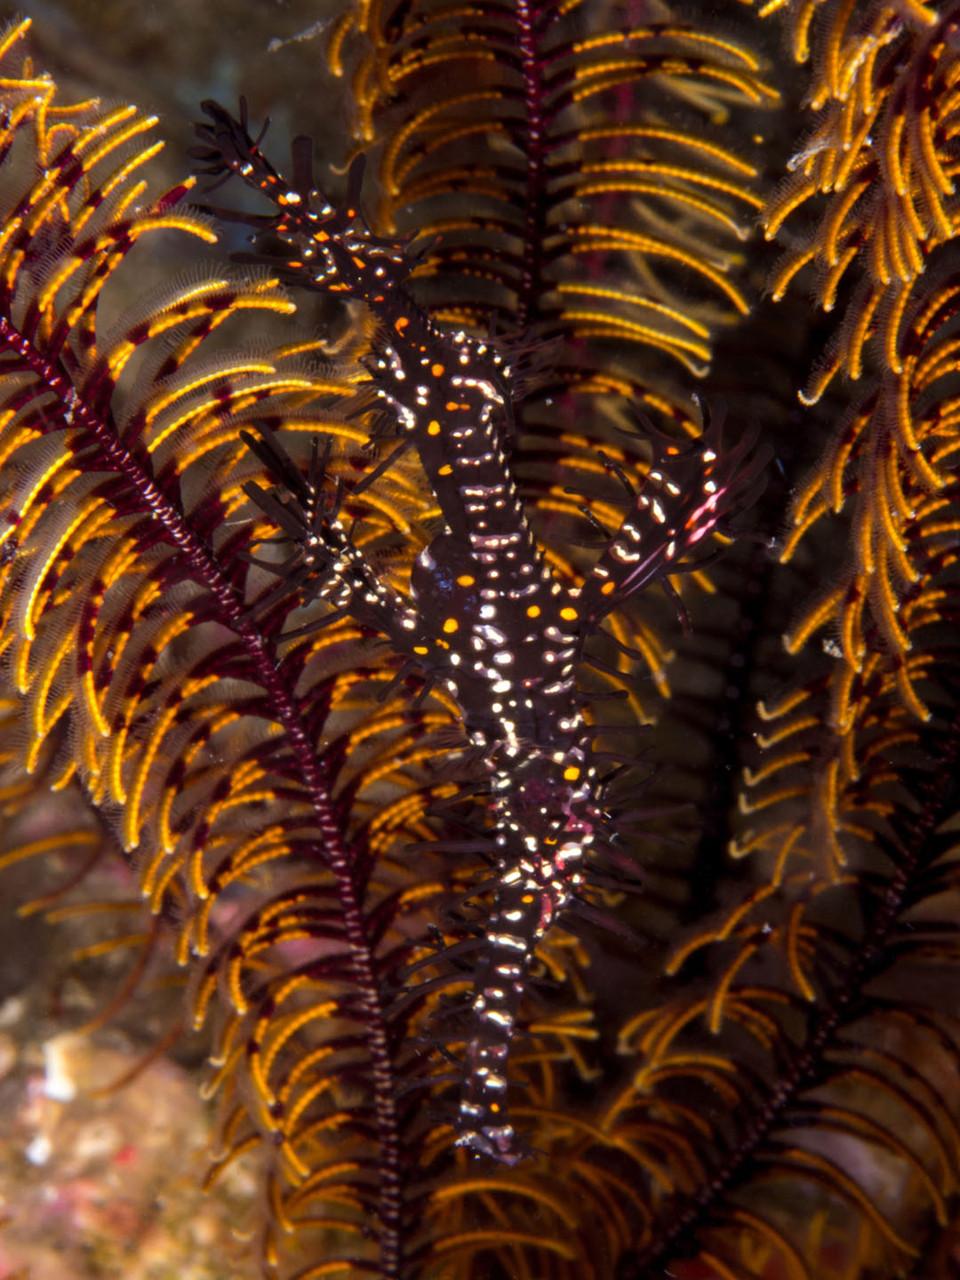 Ornate ghost pipefish (Solenostomus paradoxus)